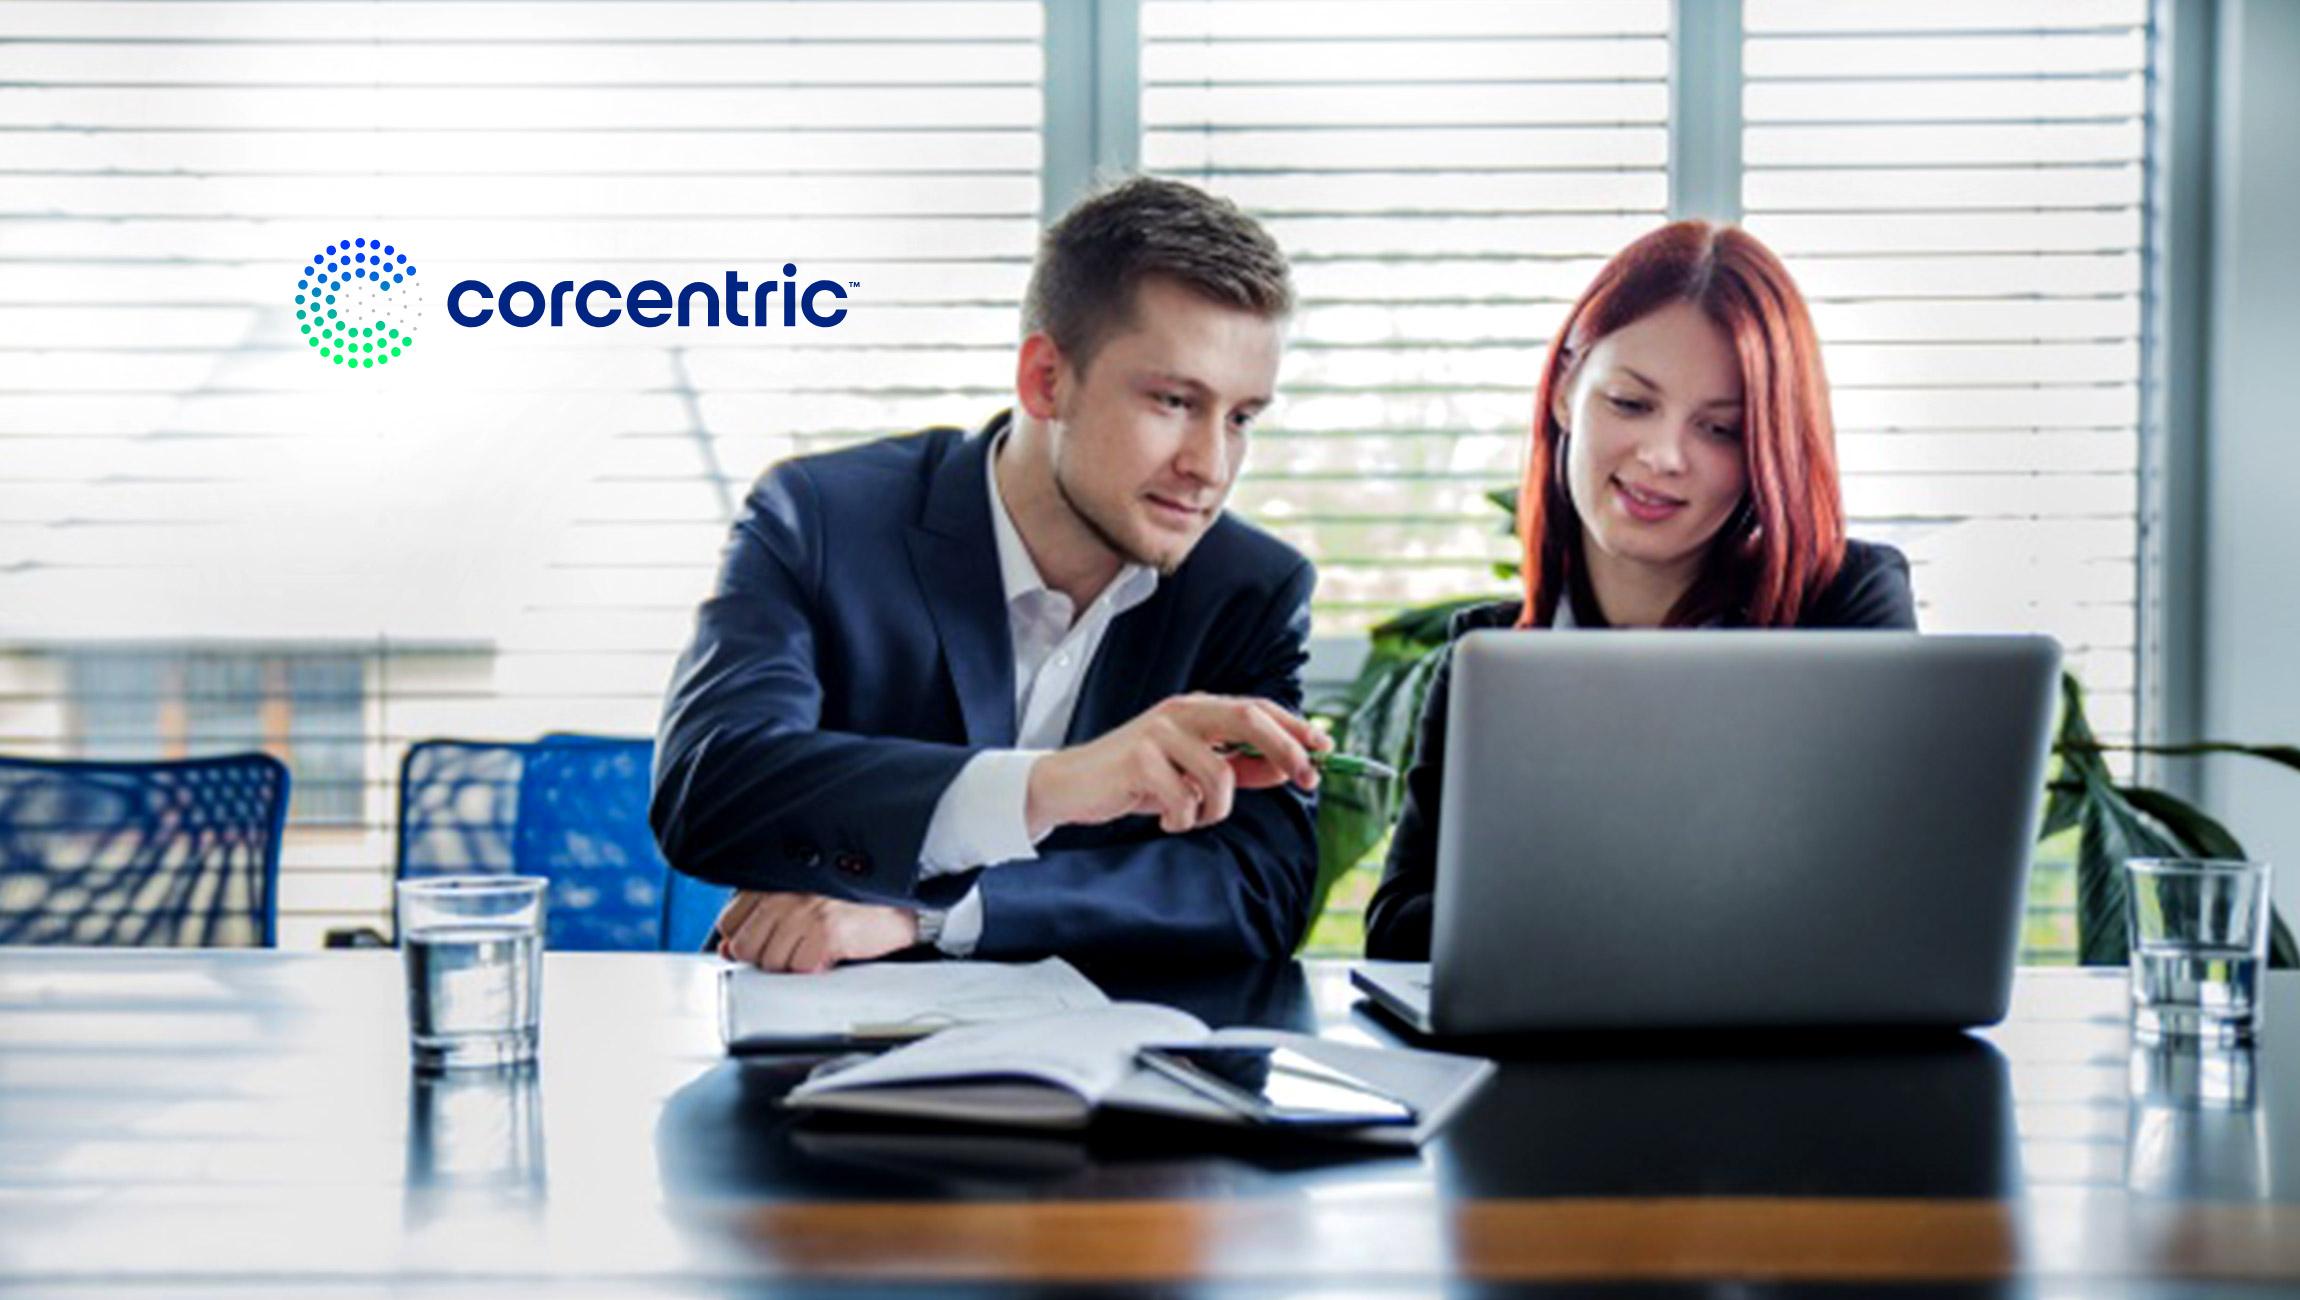 Corcentric Expands Partnership with Conversion Technologies International (CTI)